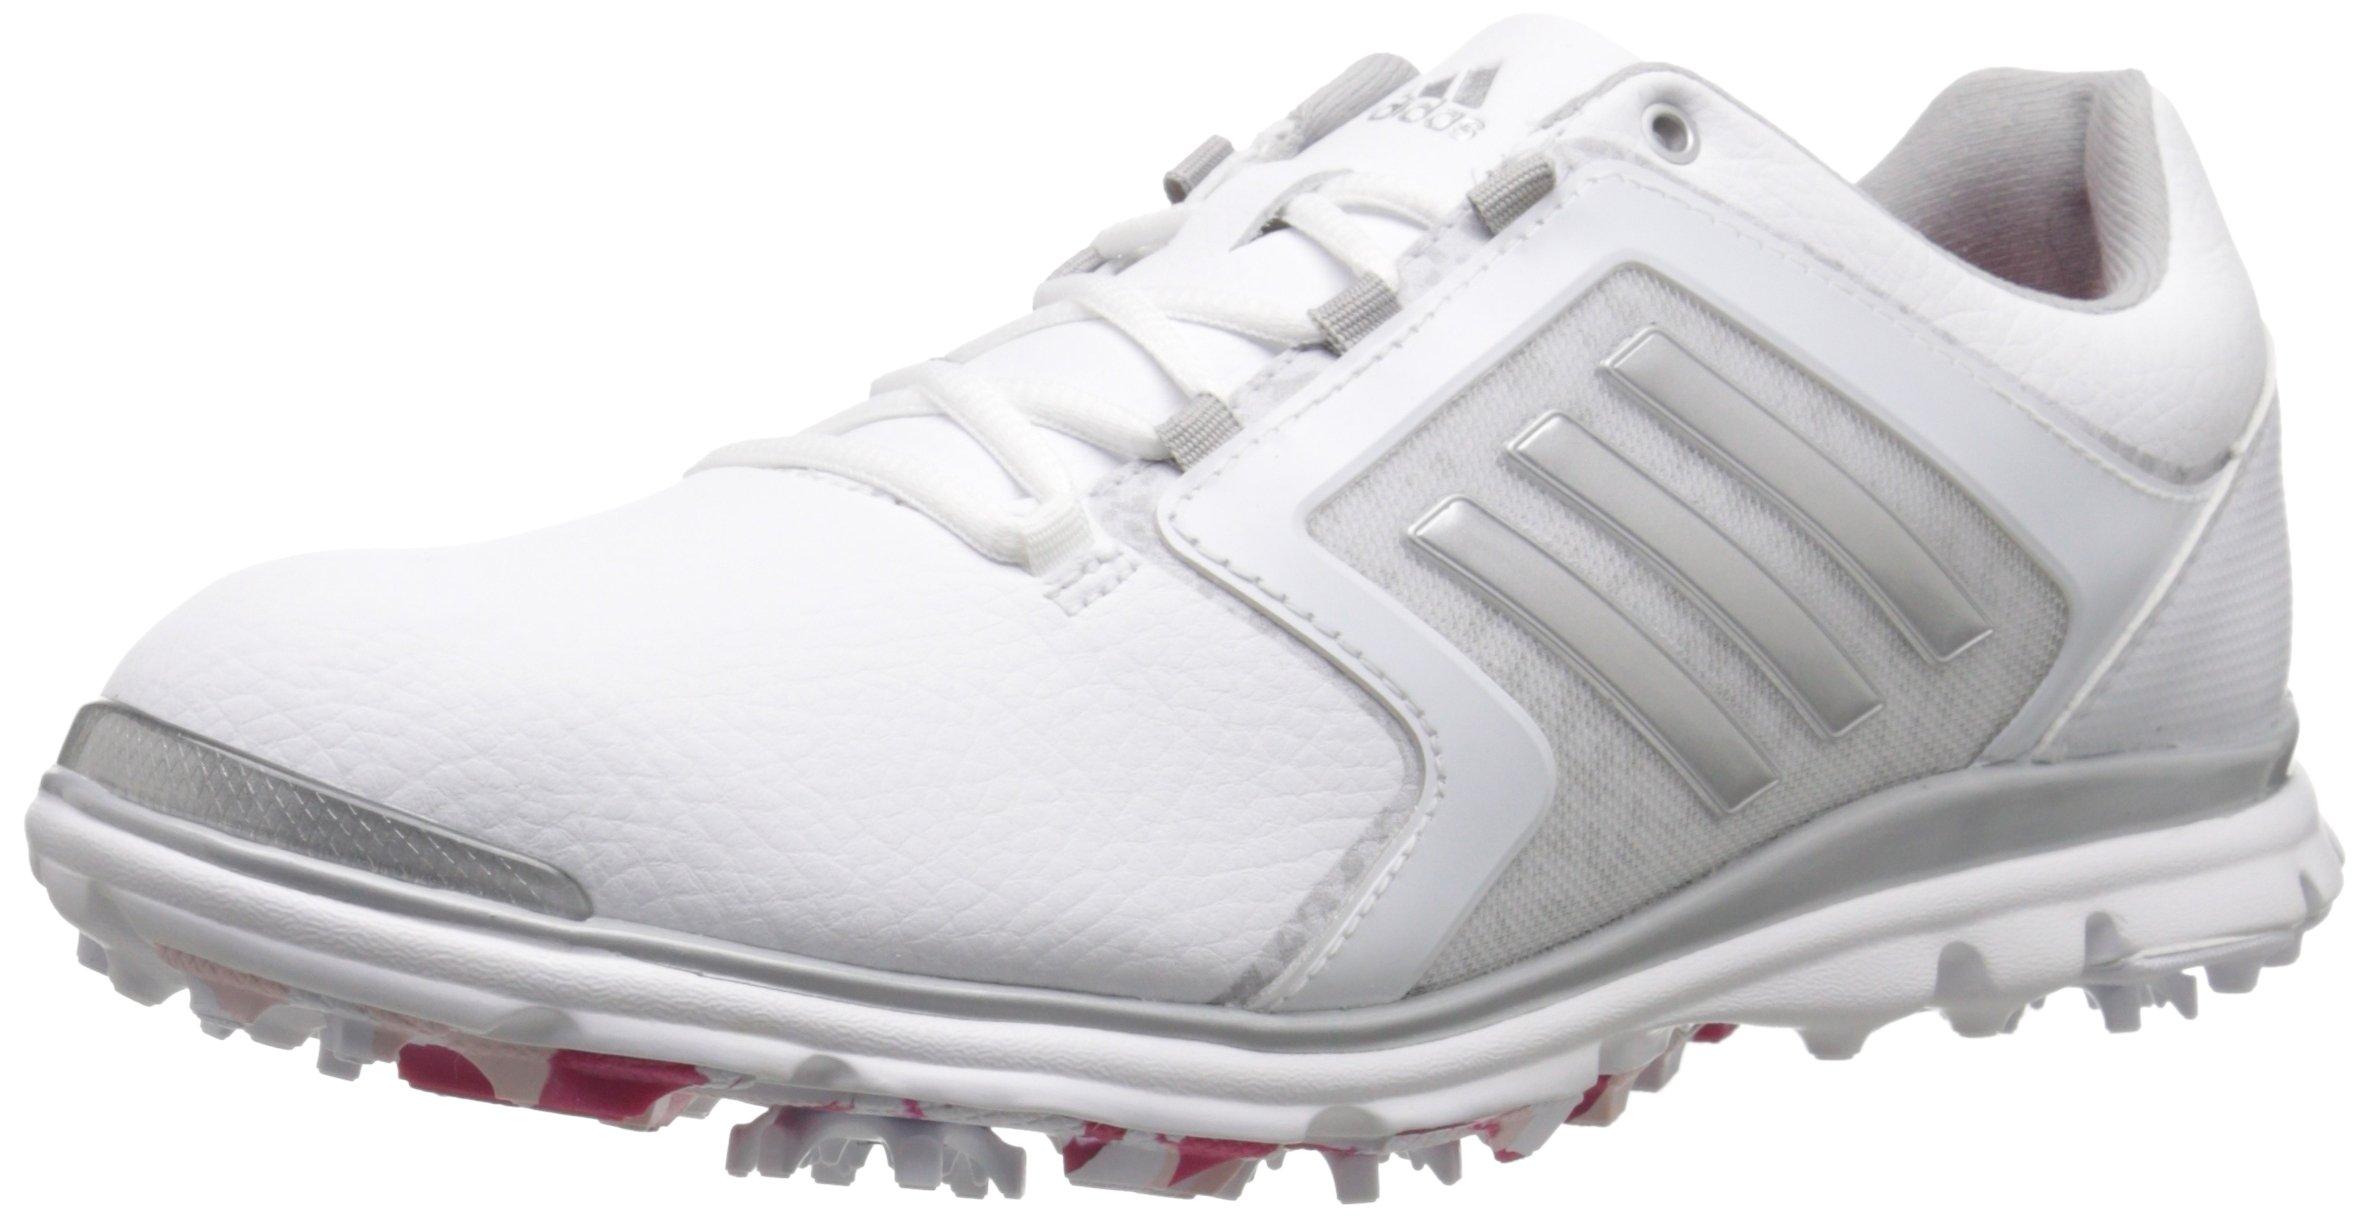 adidas Women's adistar Tour 6-spike Golf Shoe, Ftwr White/Matte Silver/Raspberry Rose-tmag - 6 B(M) US